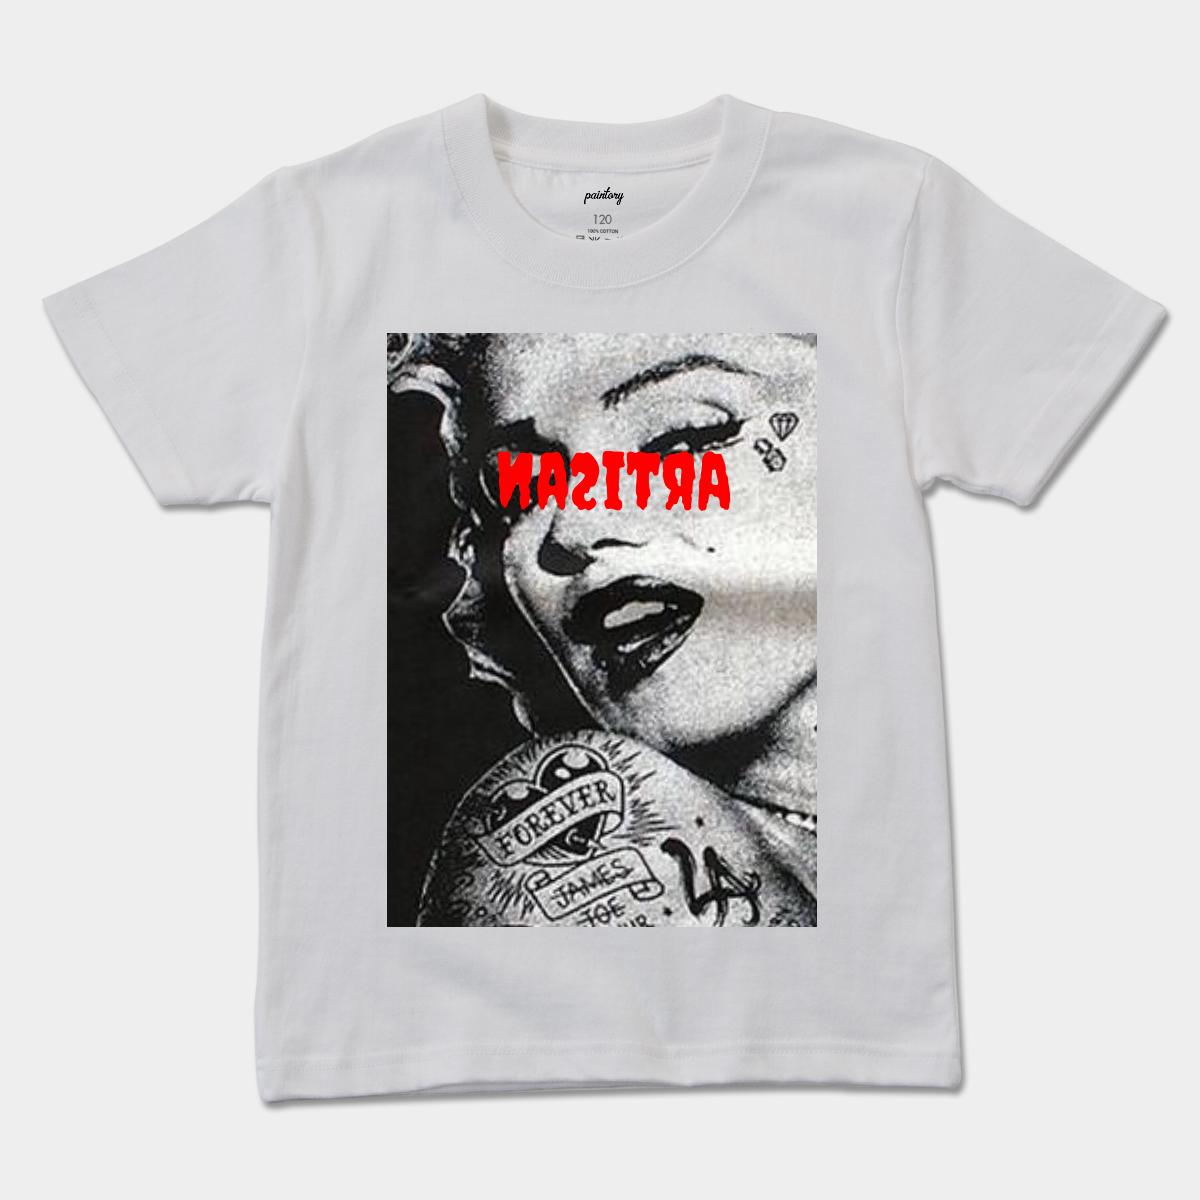 Artisanのキッズ Tシャツ Artisanモンロー